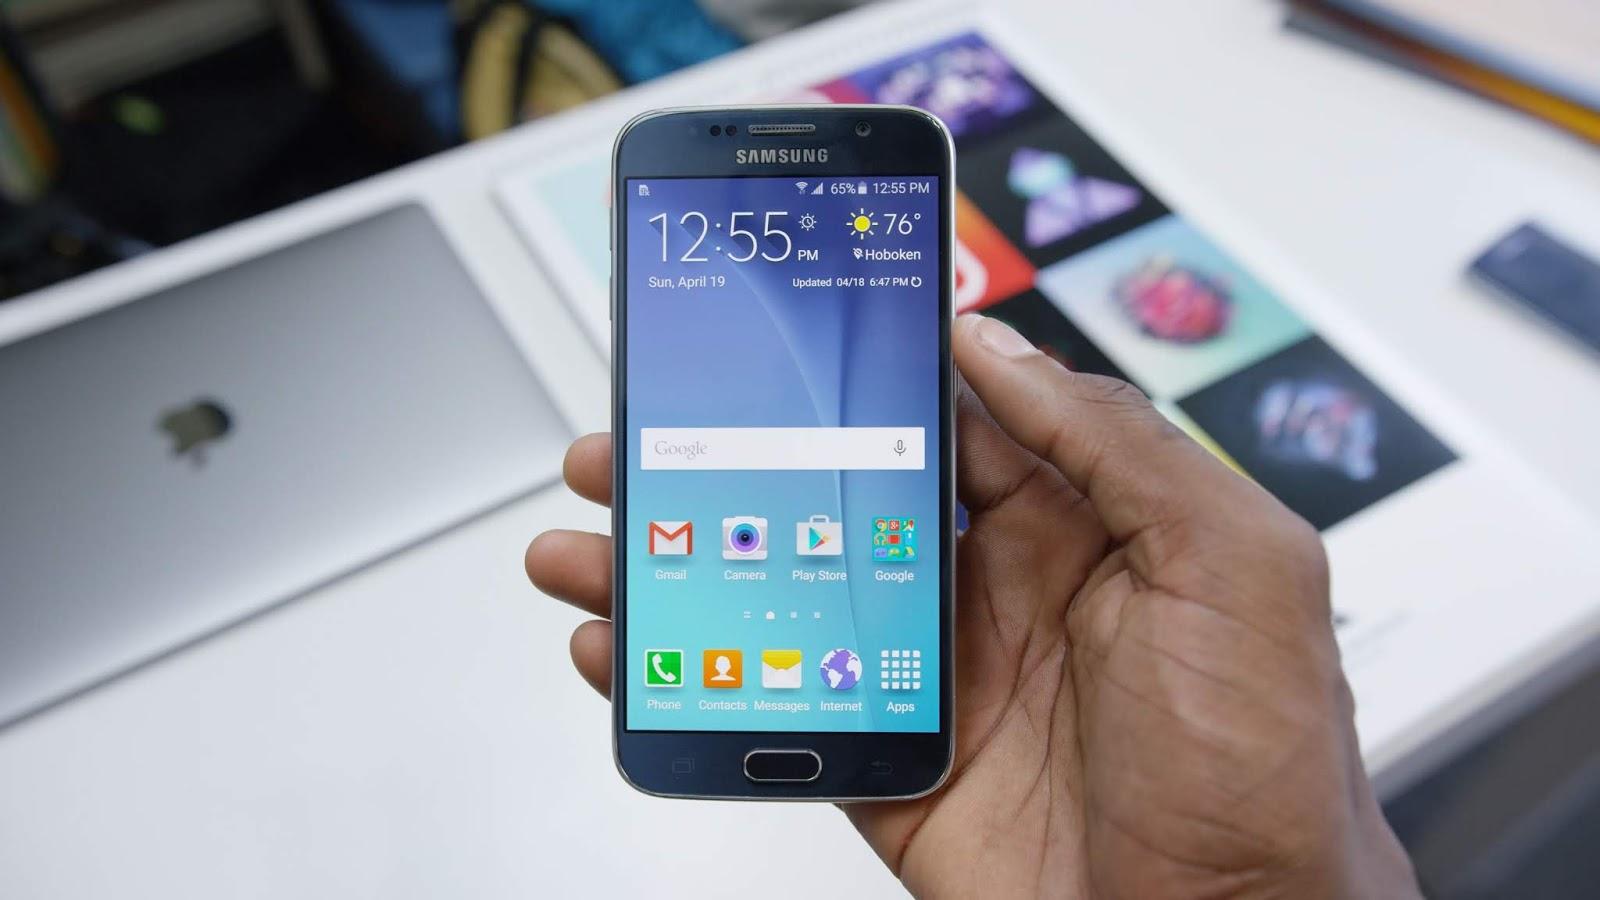 Samsung Galaxy S6 SM-S907VL Firmware Download | SamFirmware